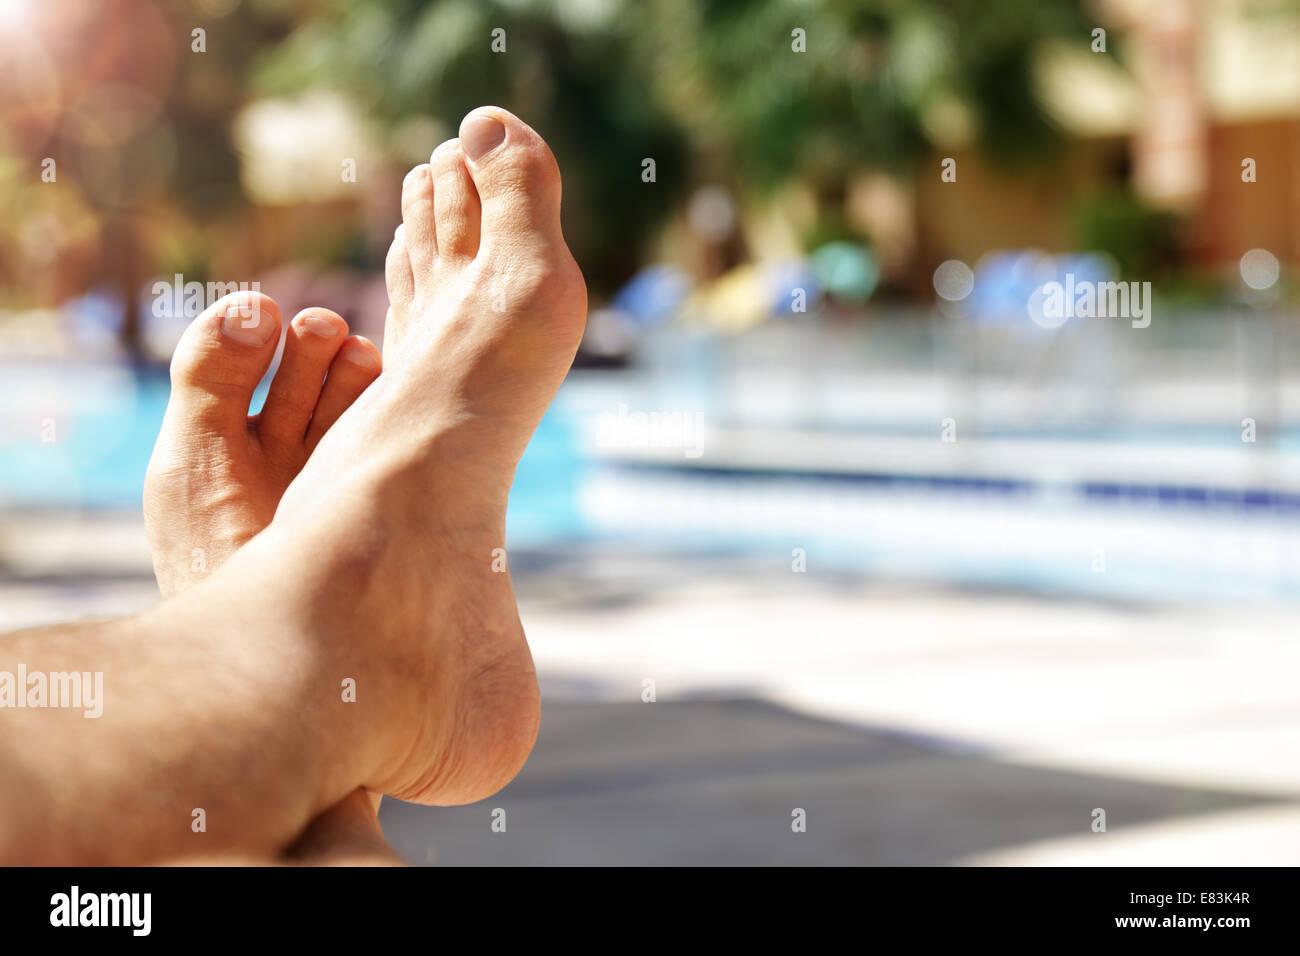 Sunbathing by swimming pool - Stock Image